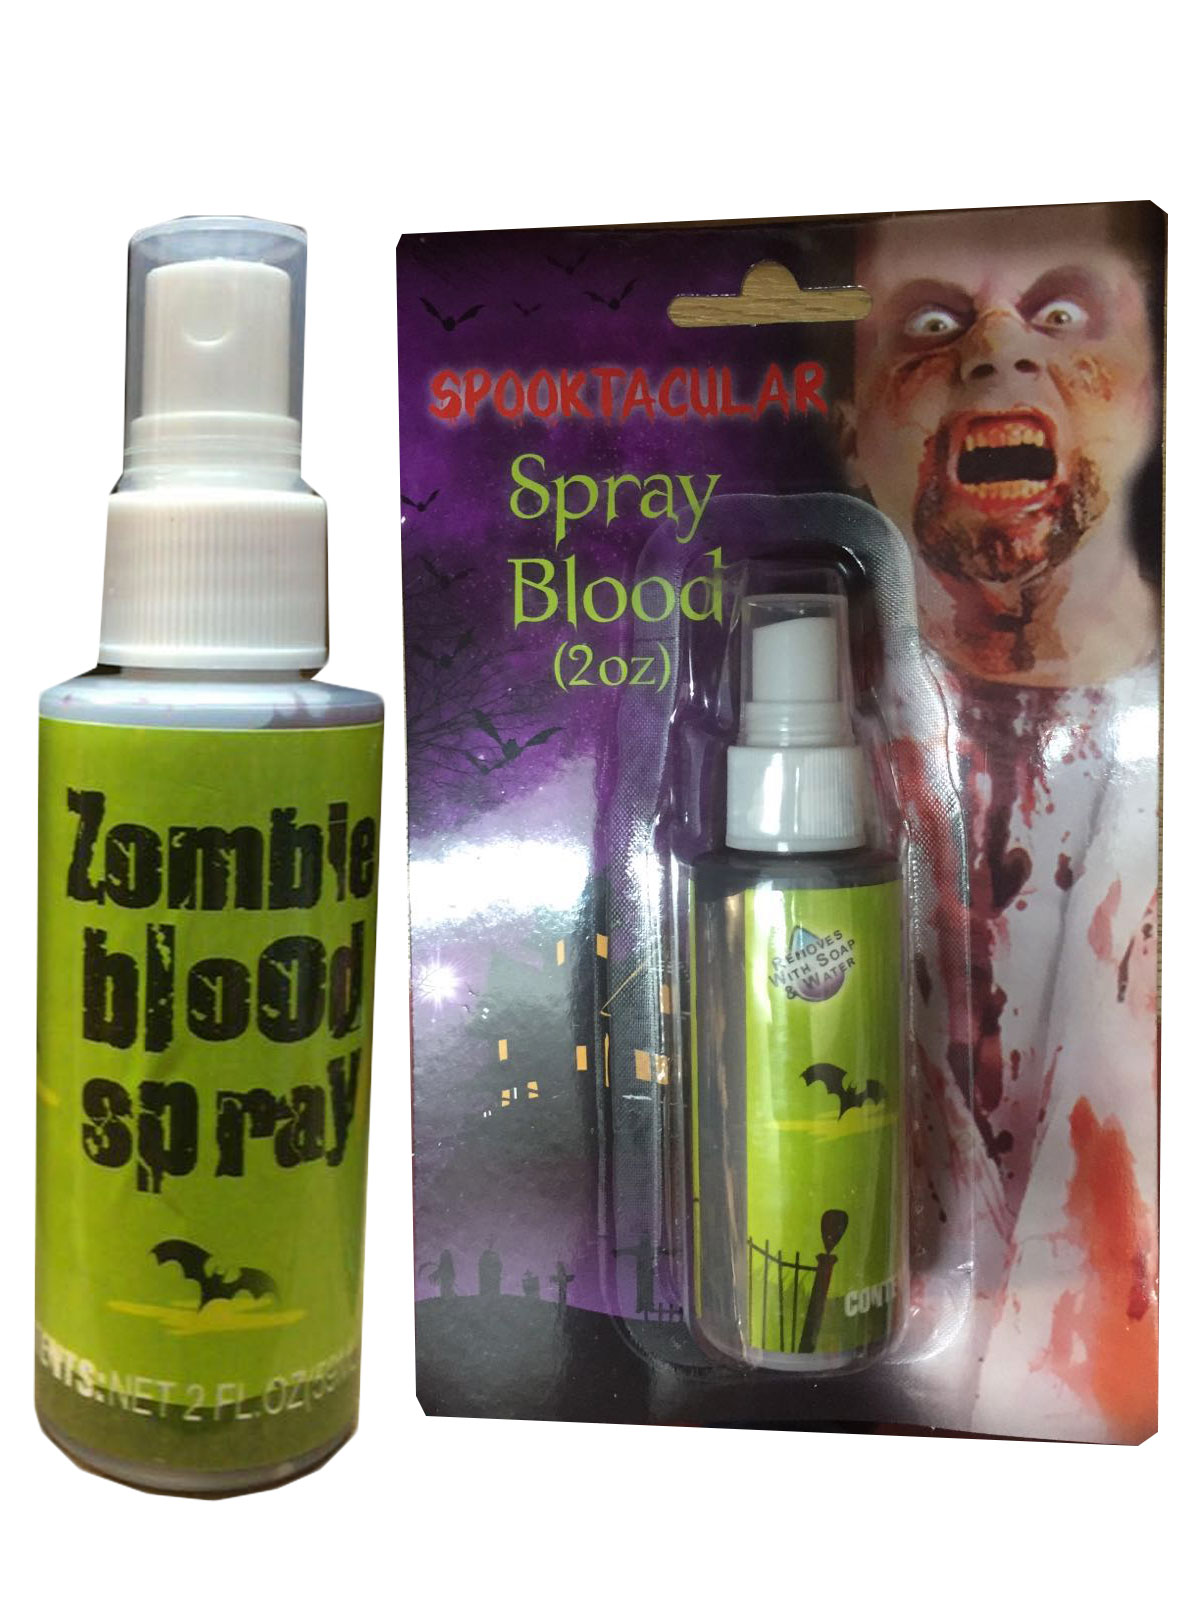 2oz Spray Blood